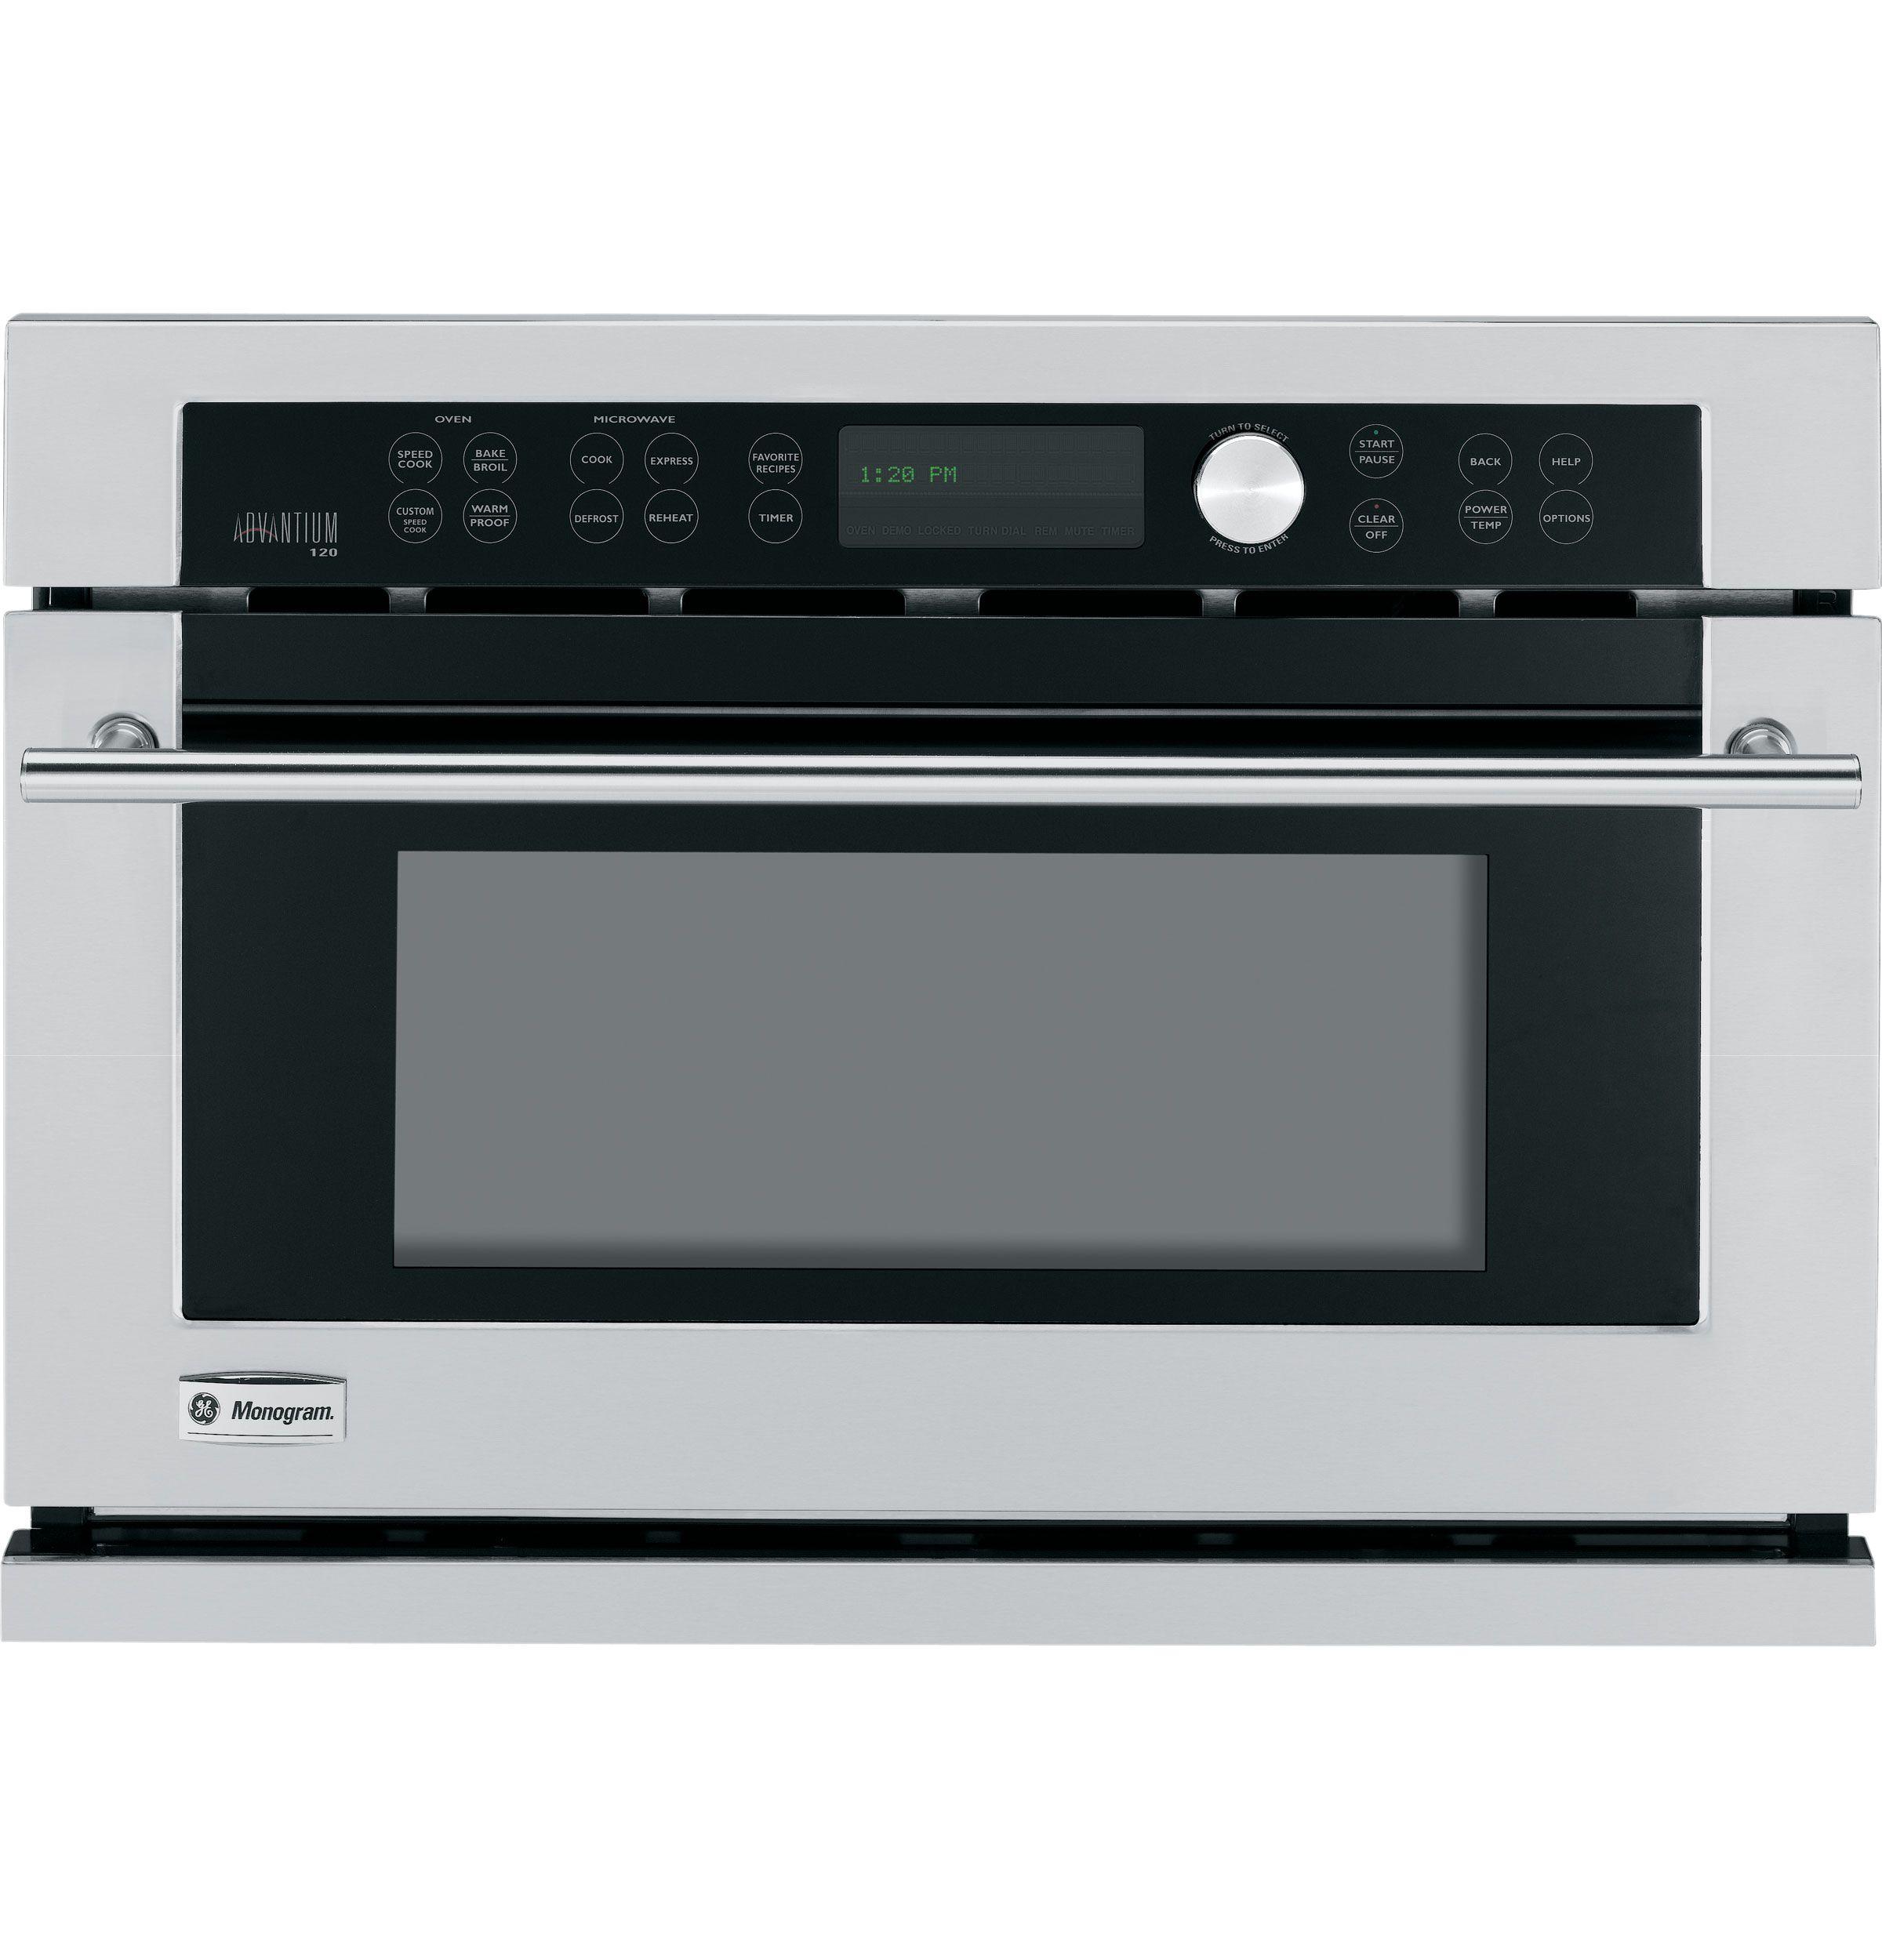 Zsc1001kss Ge Monogram Built In Oven With Advantium